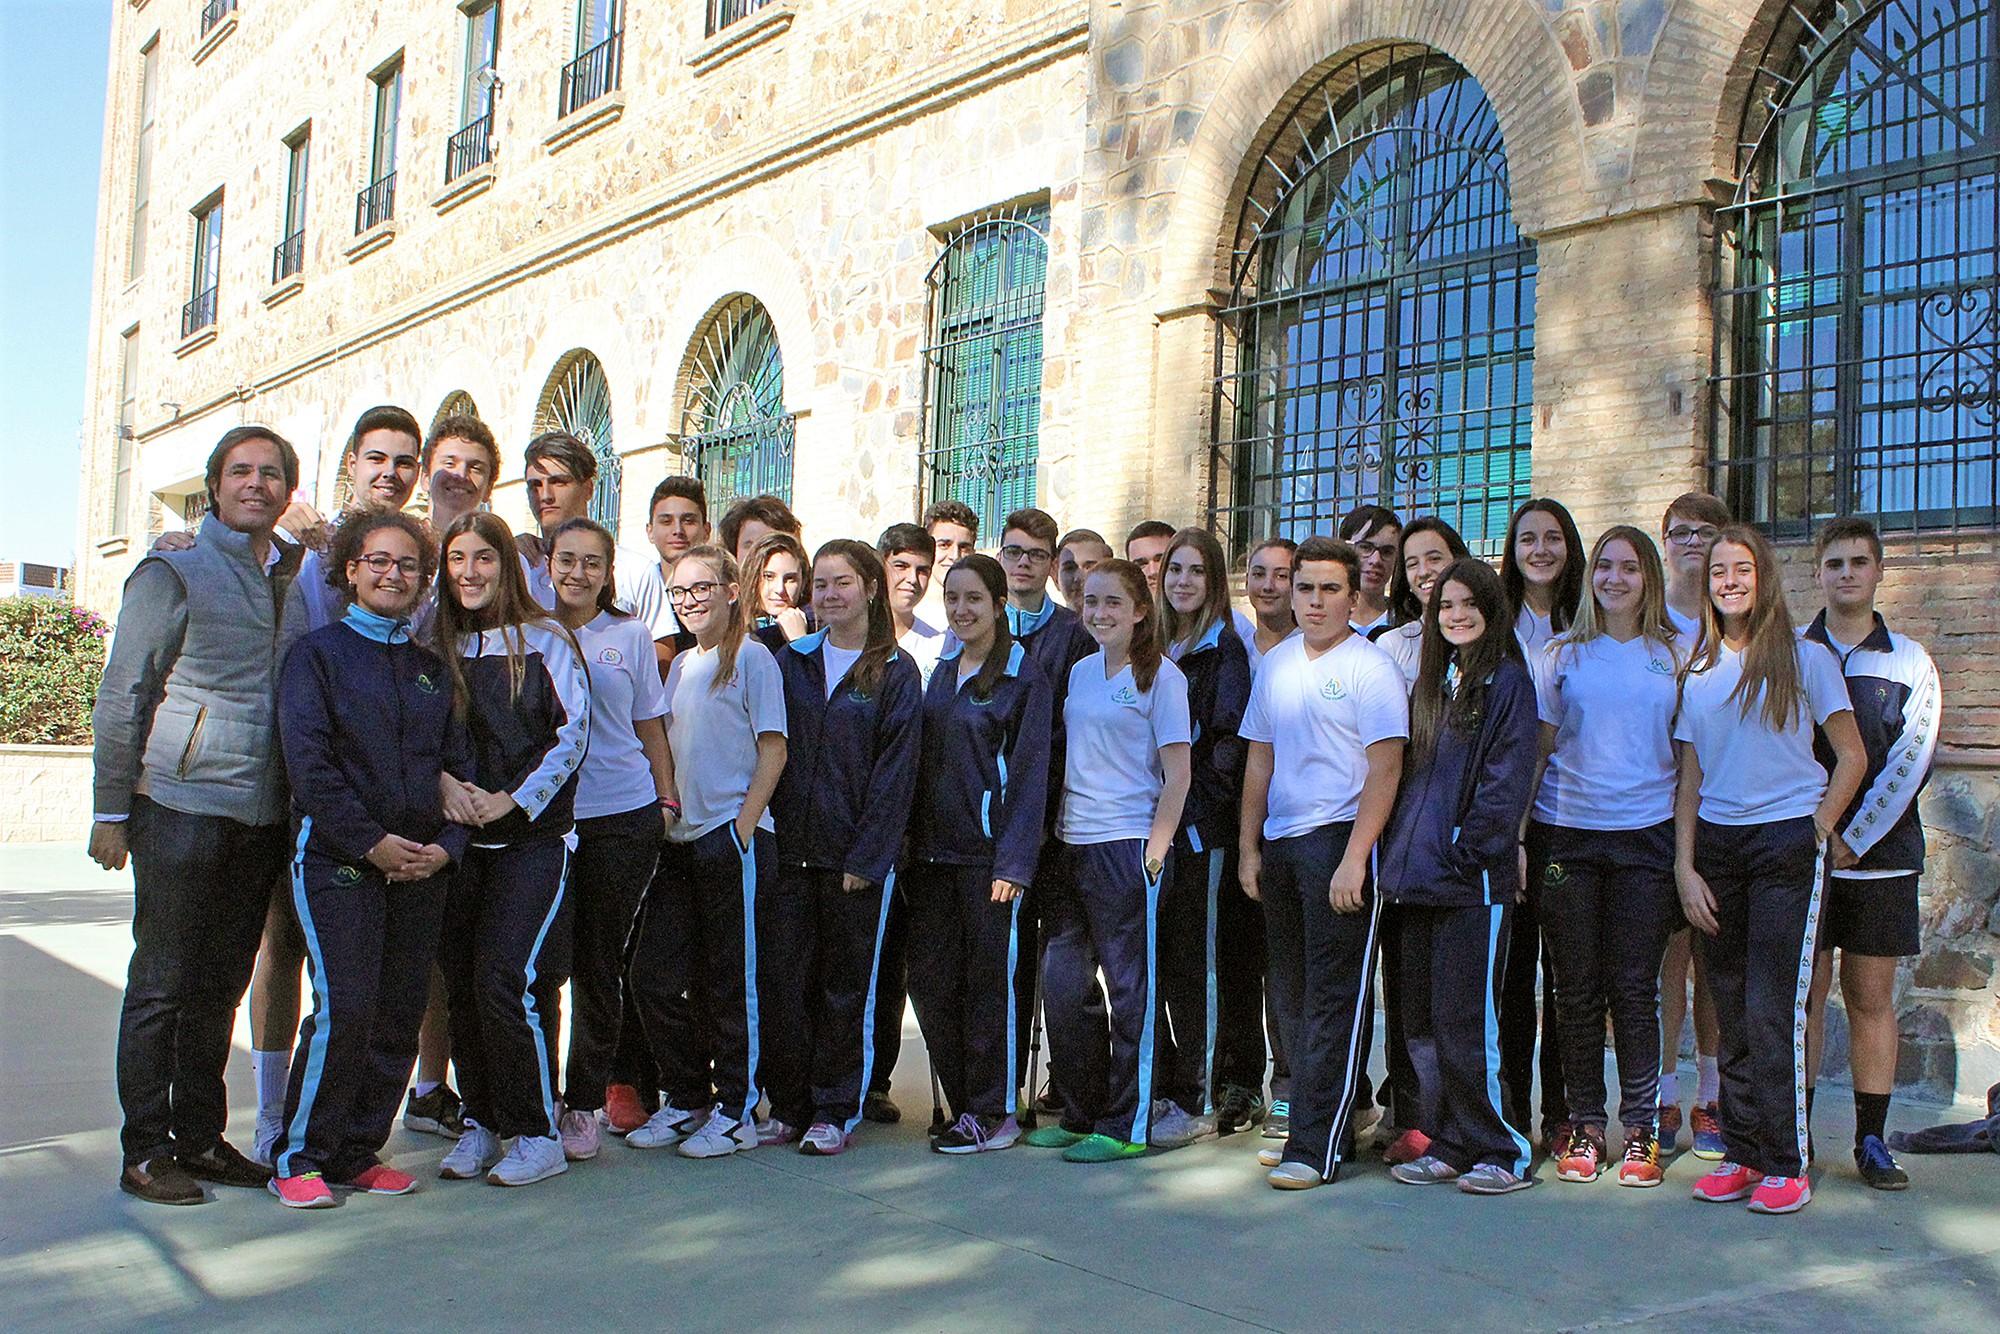 Colegio C. Herrera Oria. 1ºBachillerato (2017/2018)